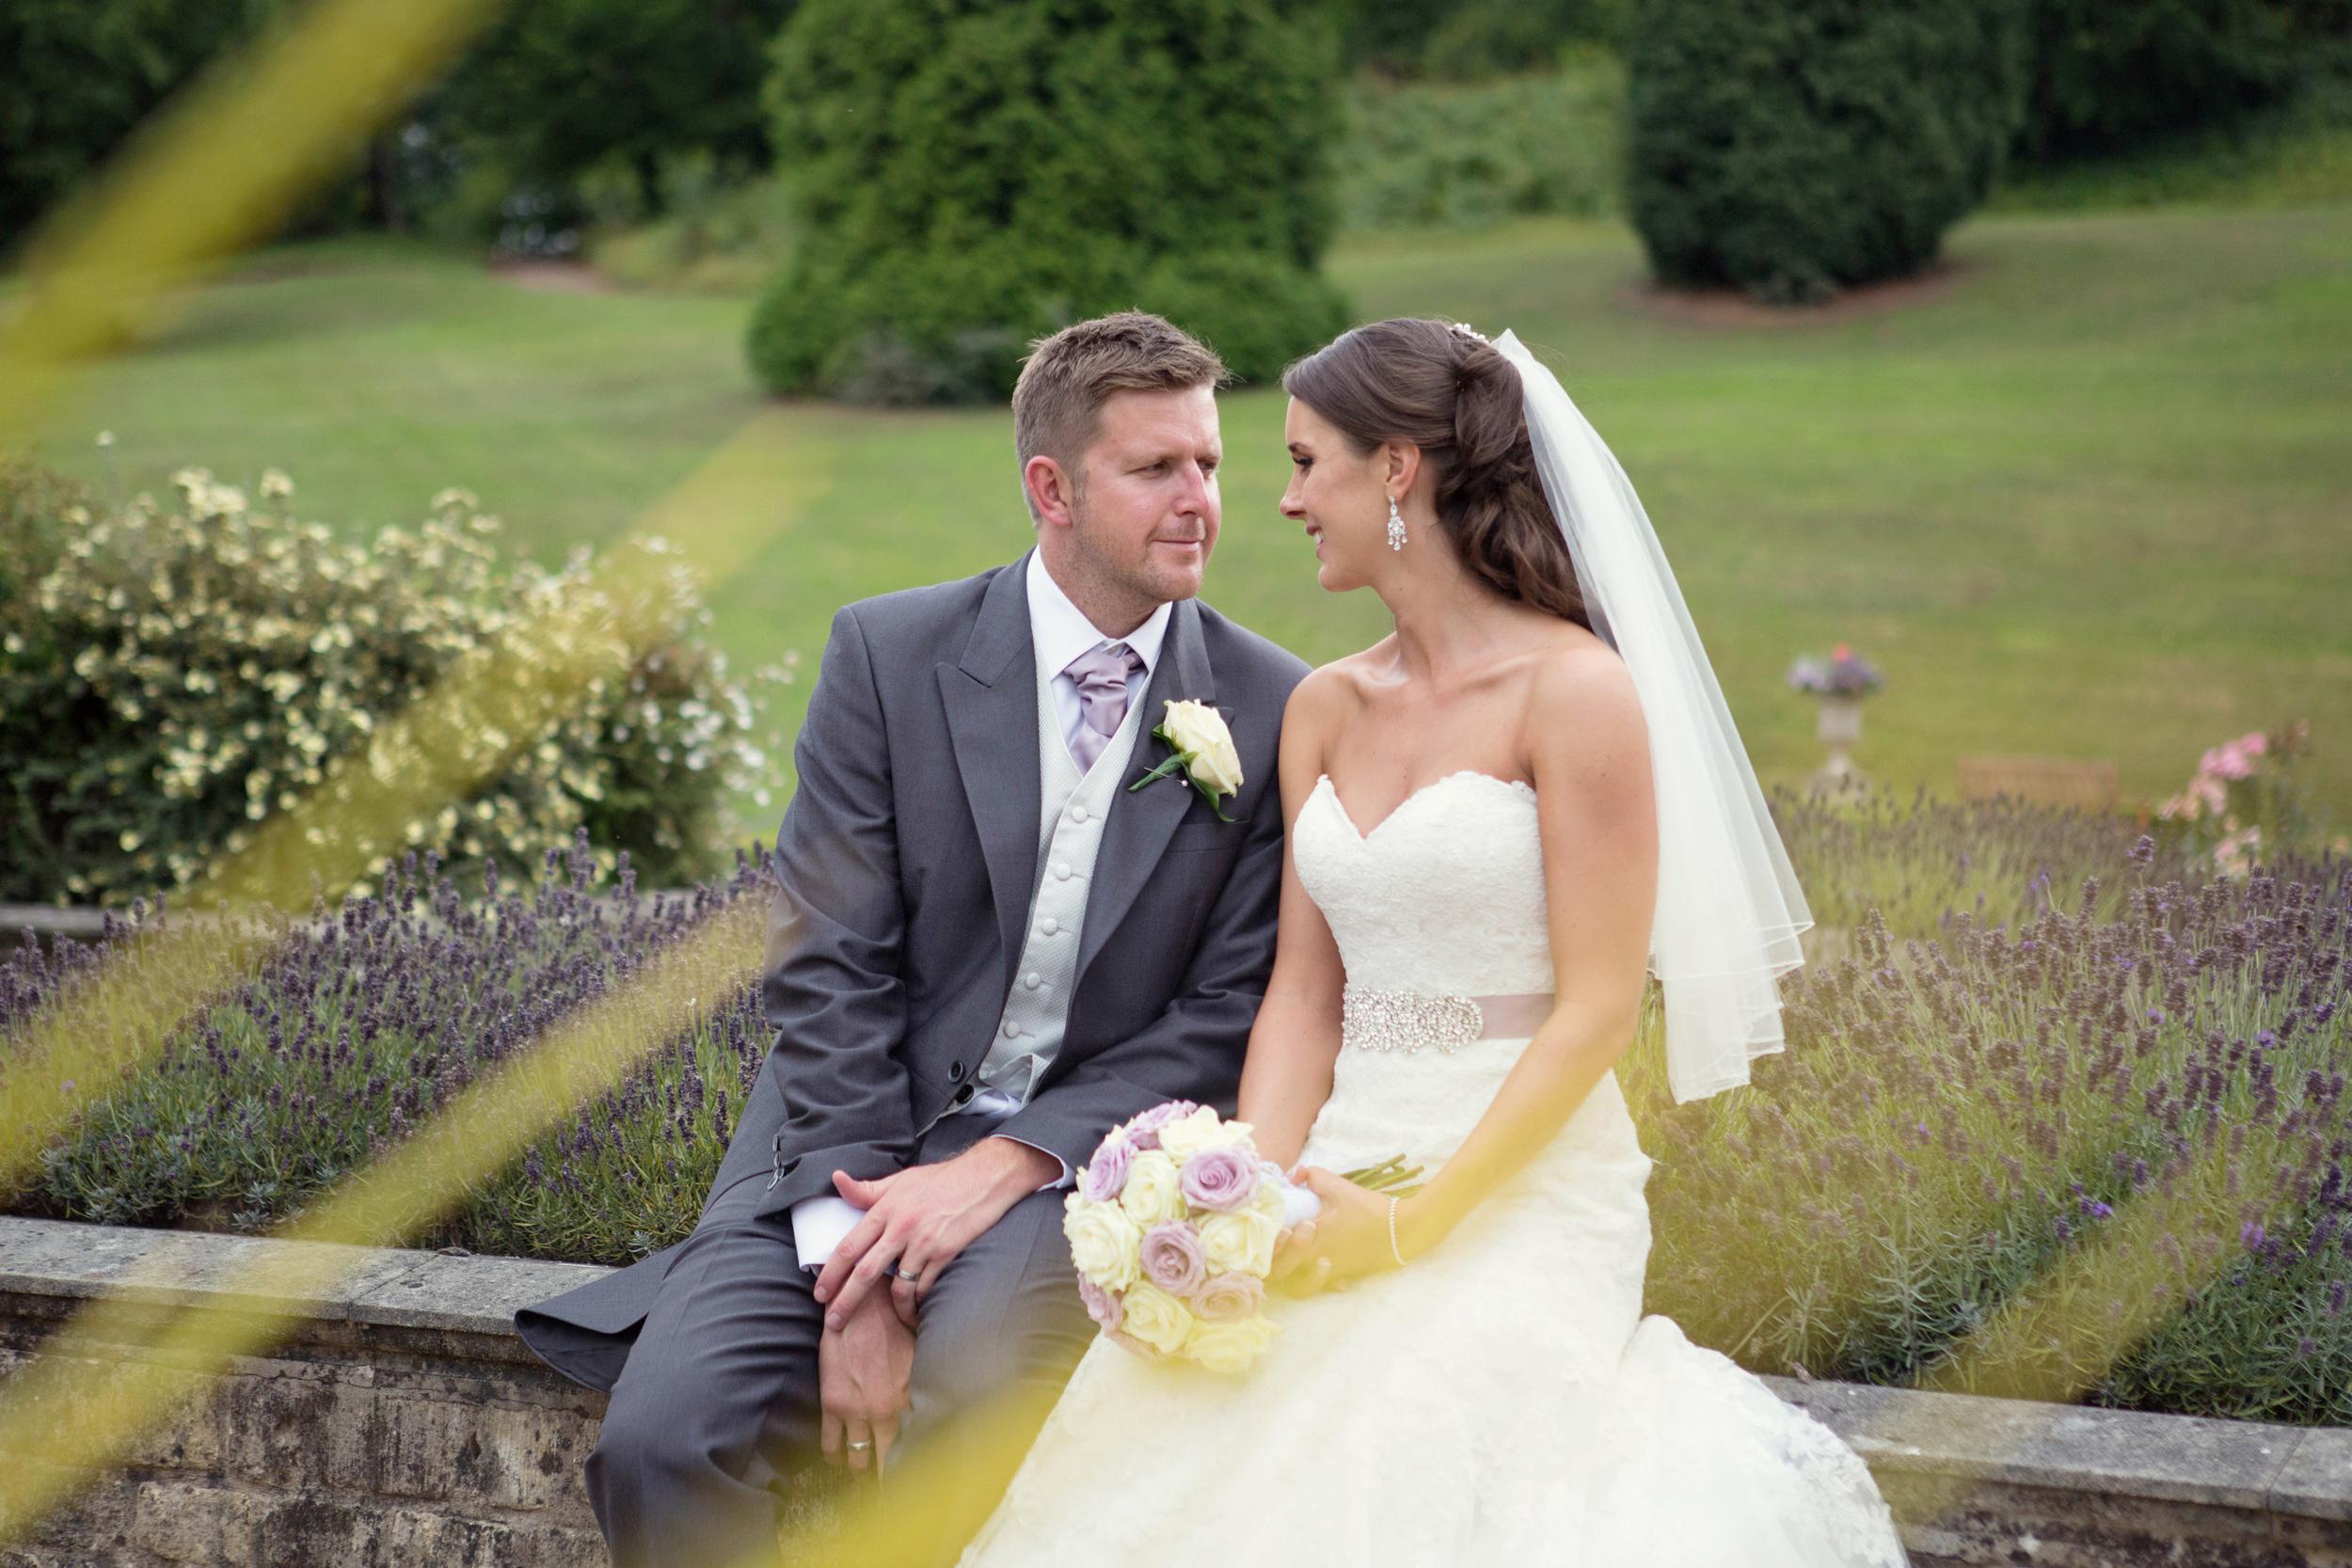 Sophie Evans Photography, Warwickshire Wedding Photography, Welcombe Hotel  (64).jpg